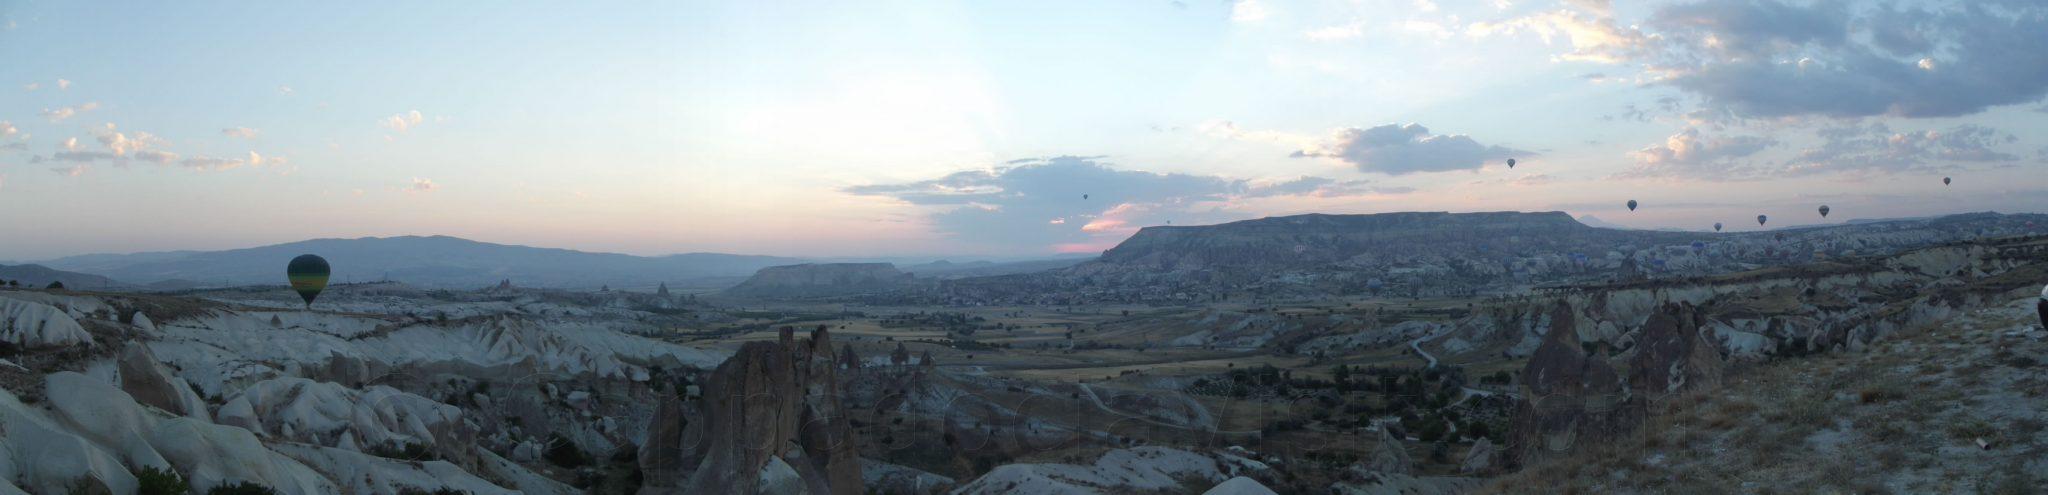 Каппадокия Панорама 4